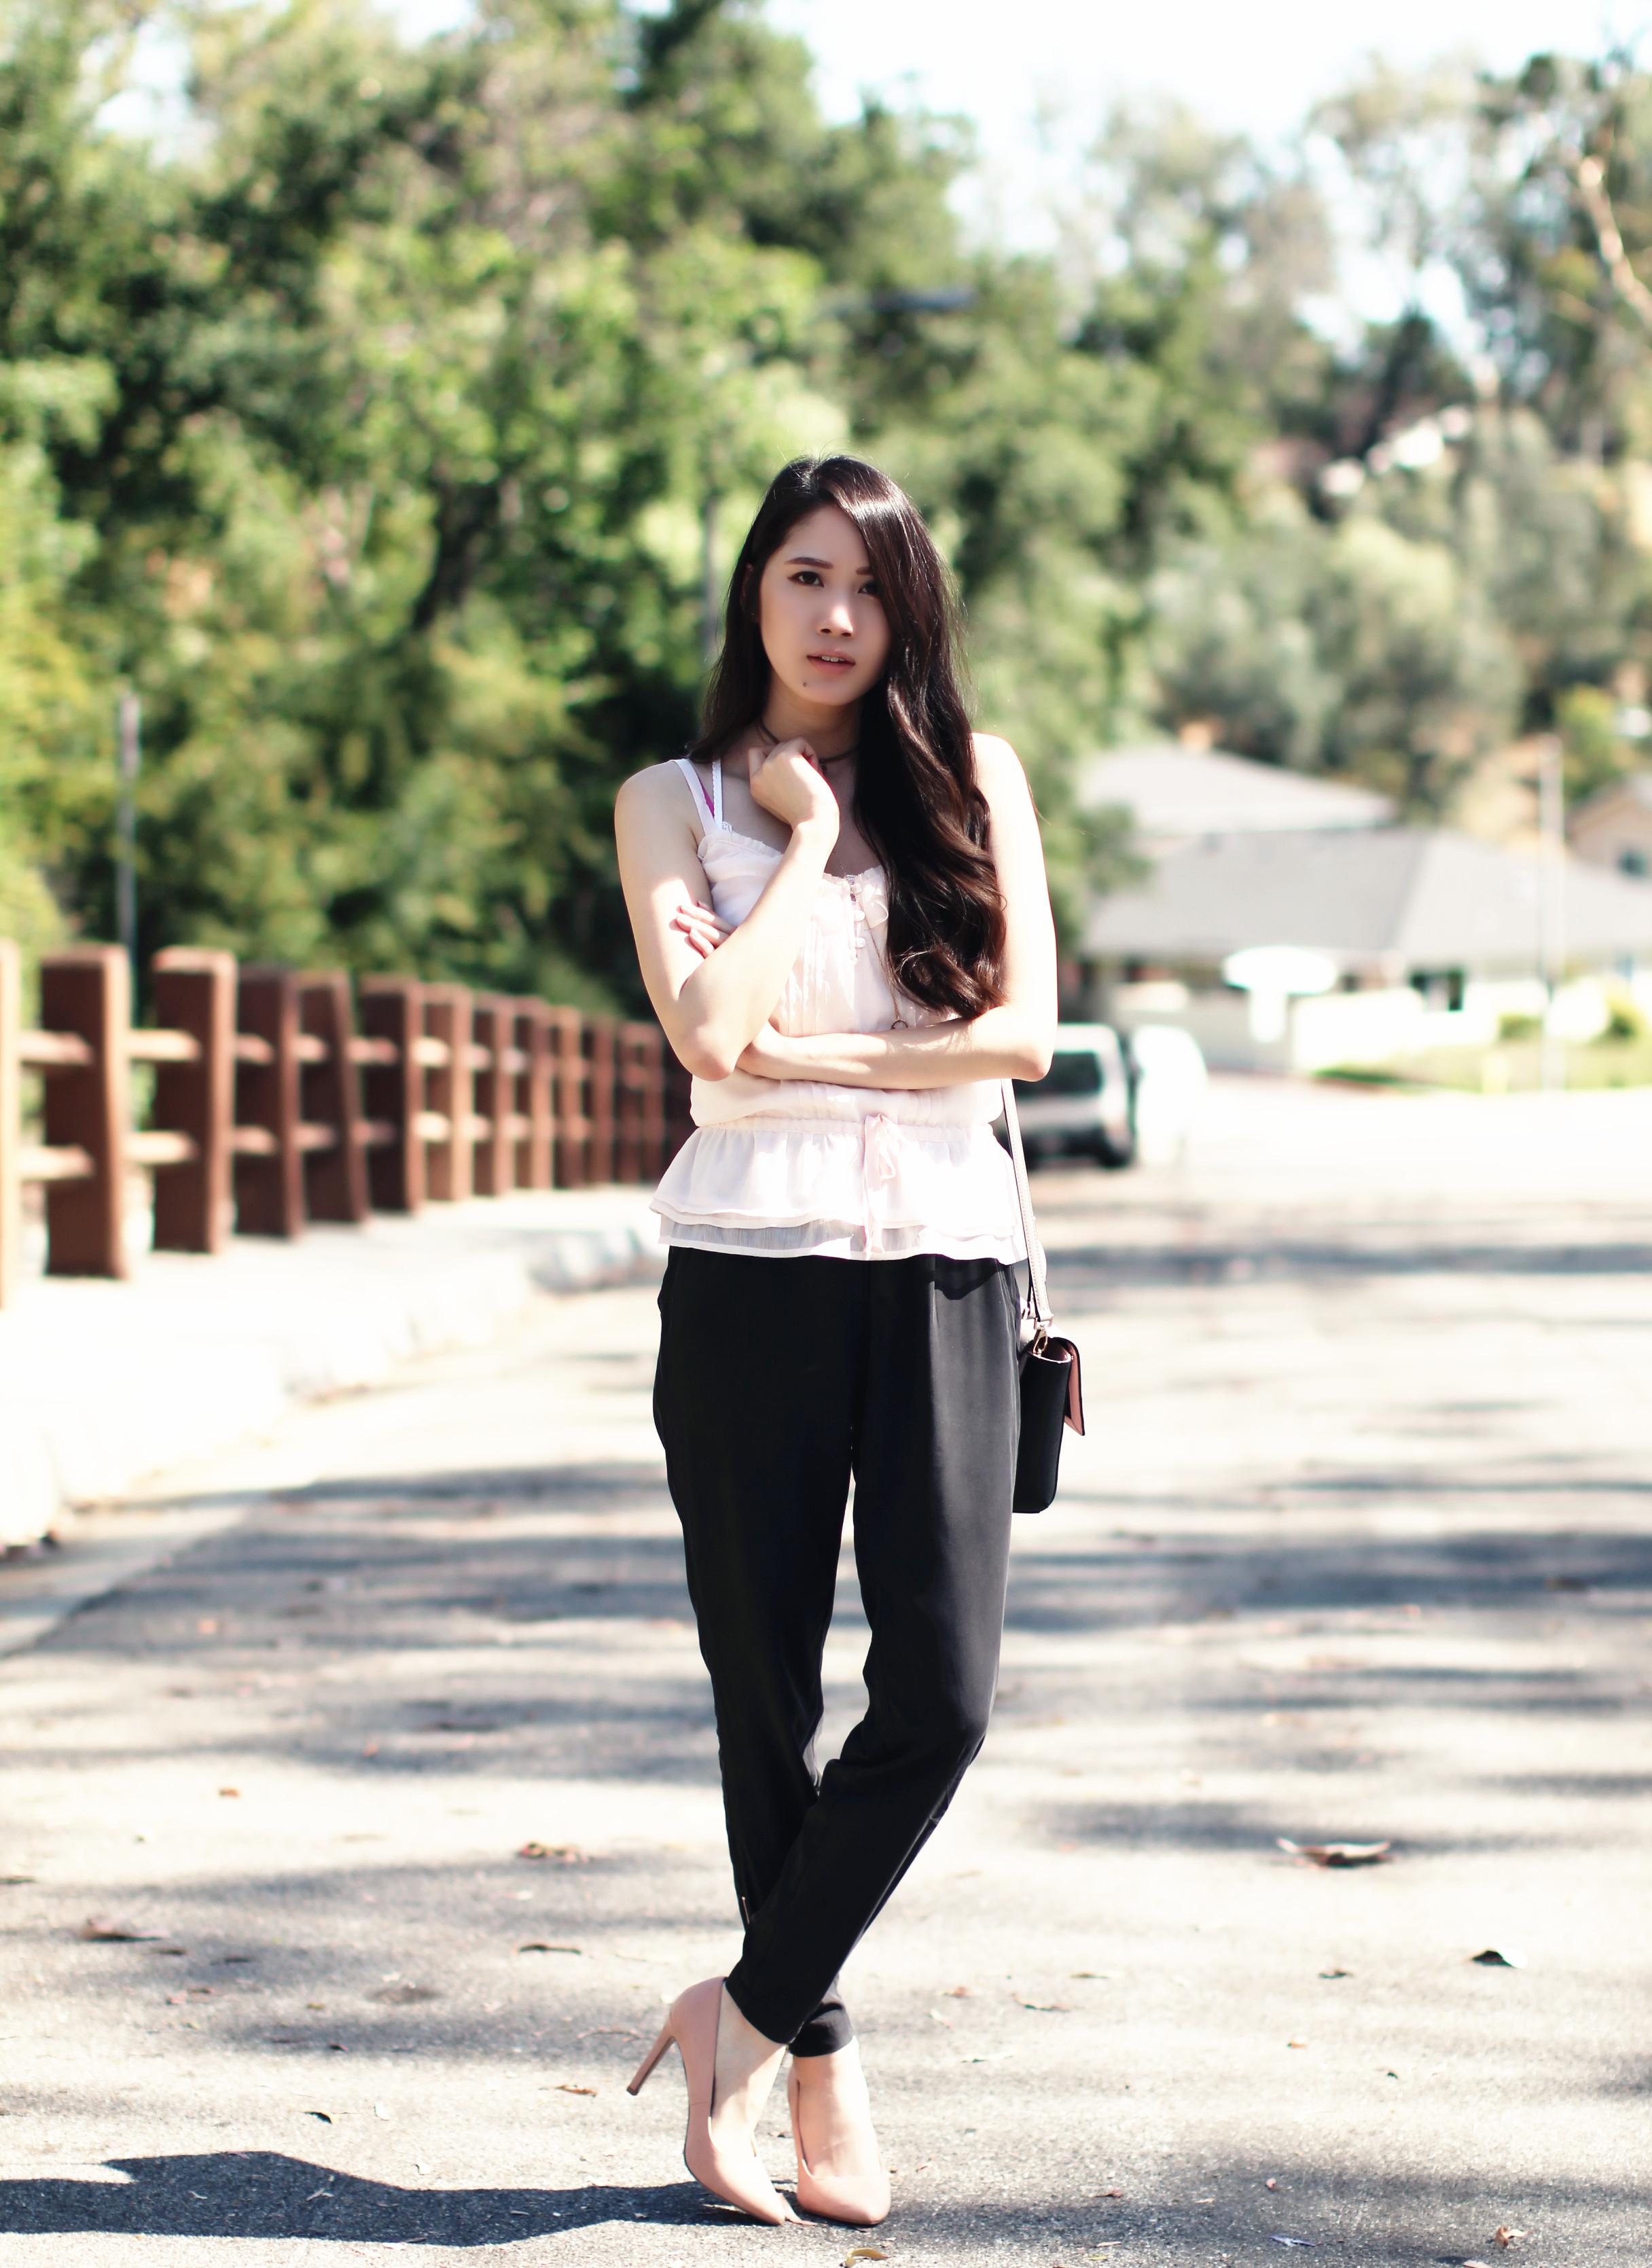 2771-ootd-fashion-outfitoftheday-summerfashion-joggers-peplum-blush-forever21-f21-abercrombie-clothestoyouuu-elizabeeetht本